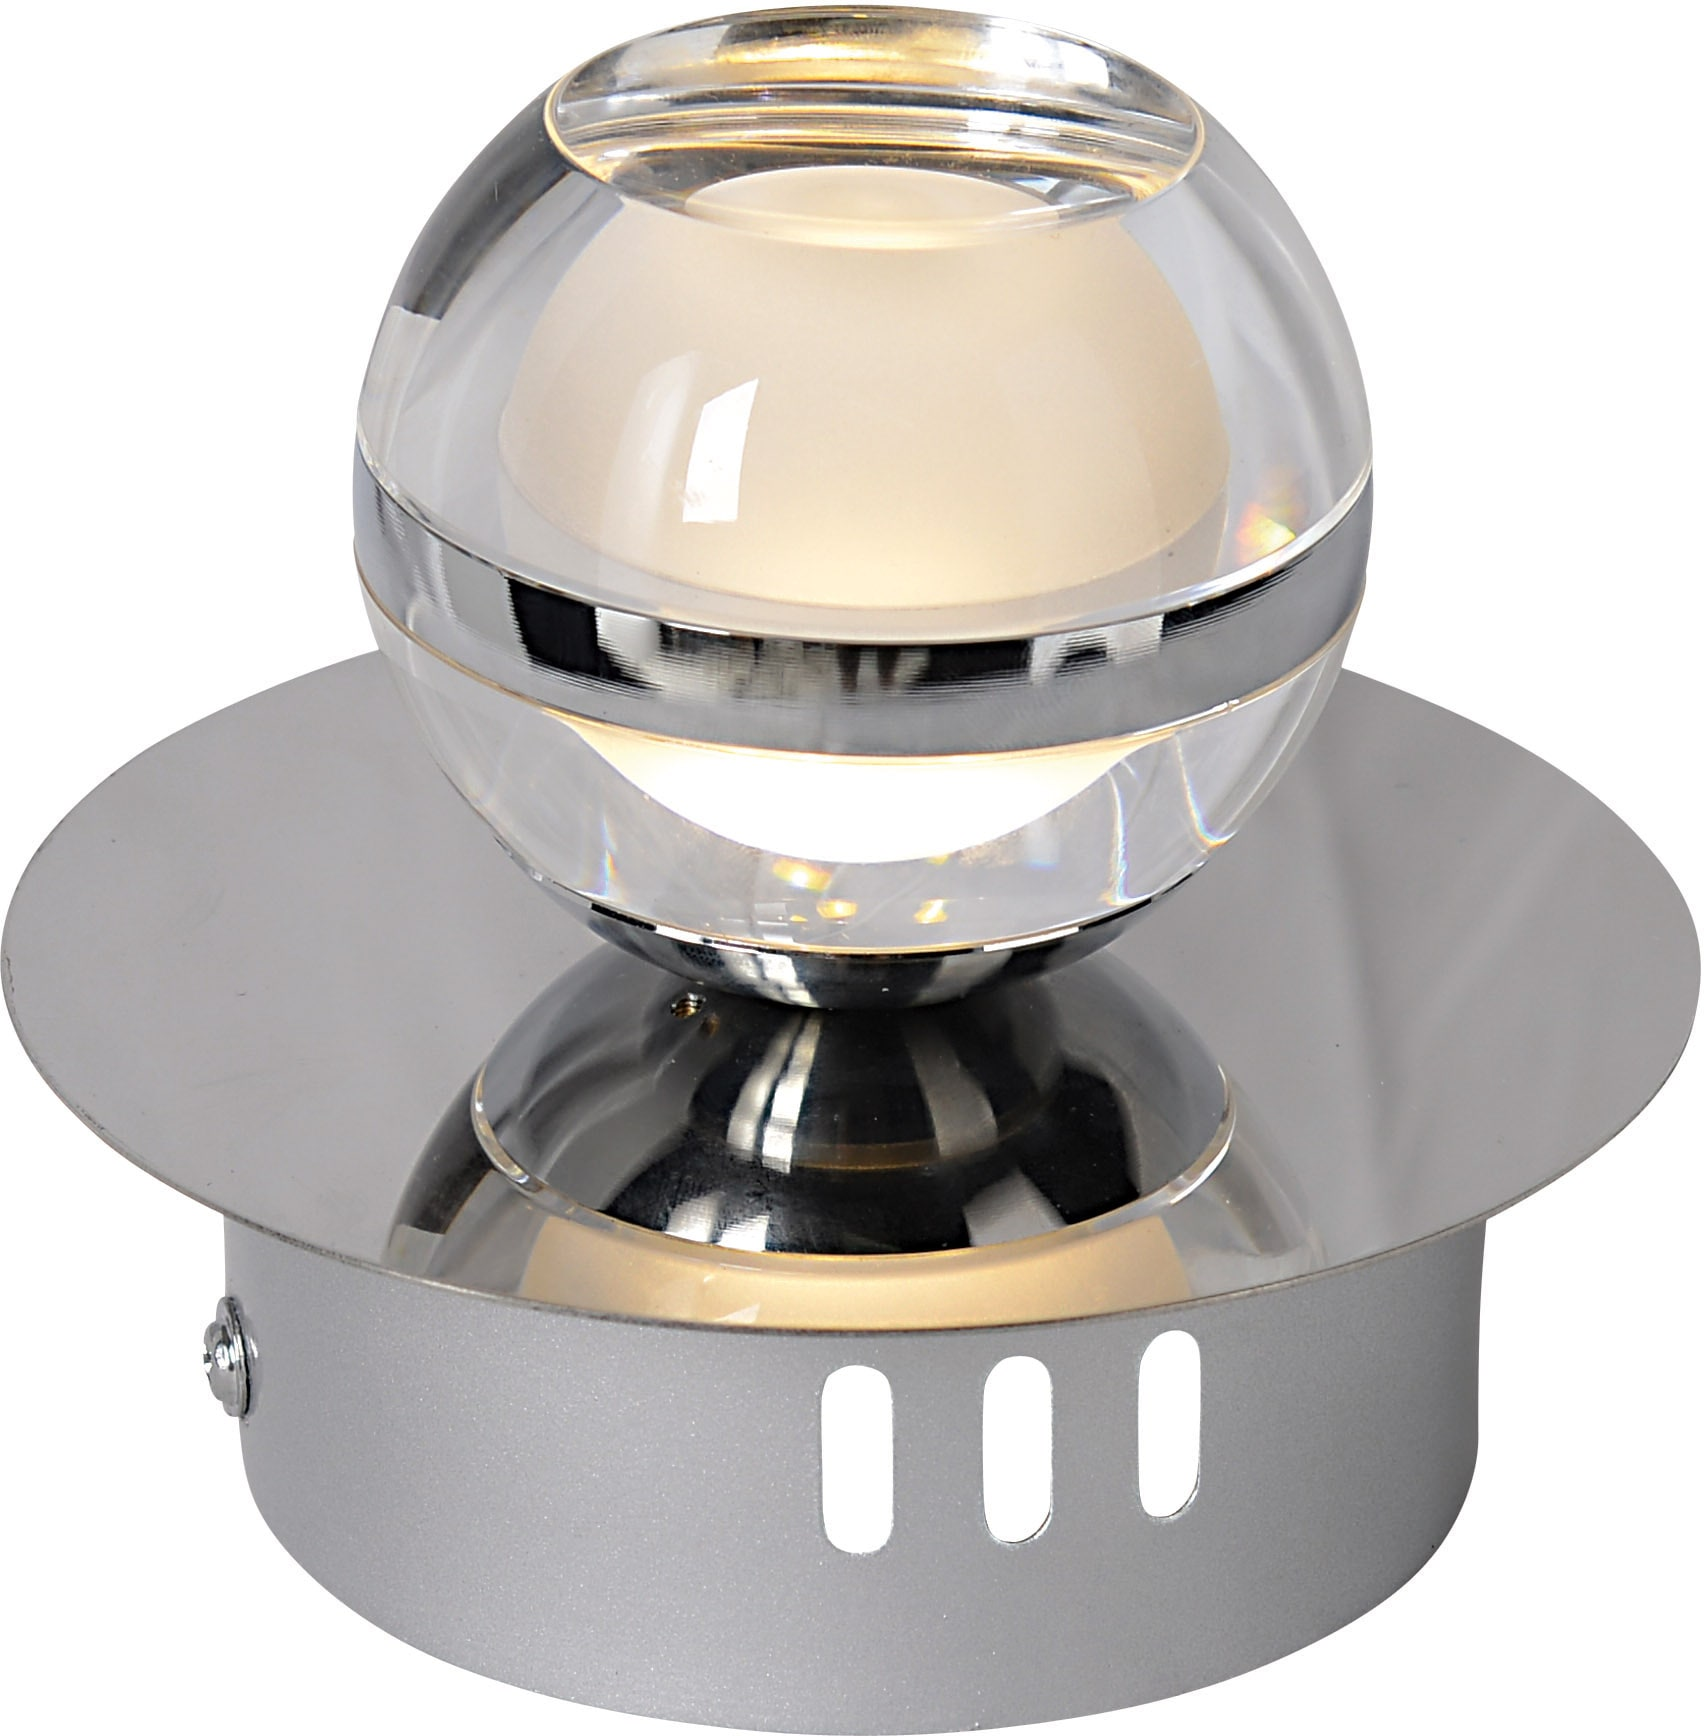 näve LED Wandstrahler Sphere, LED-Board, 1 St., Warmweiß